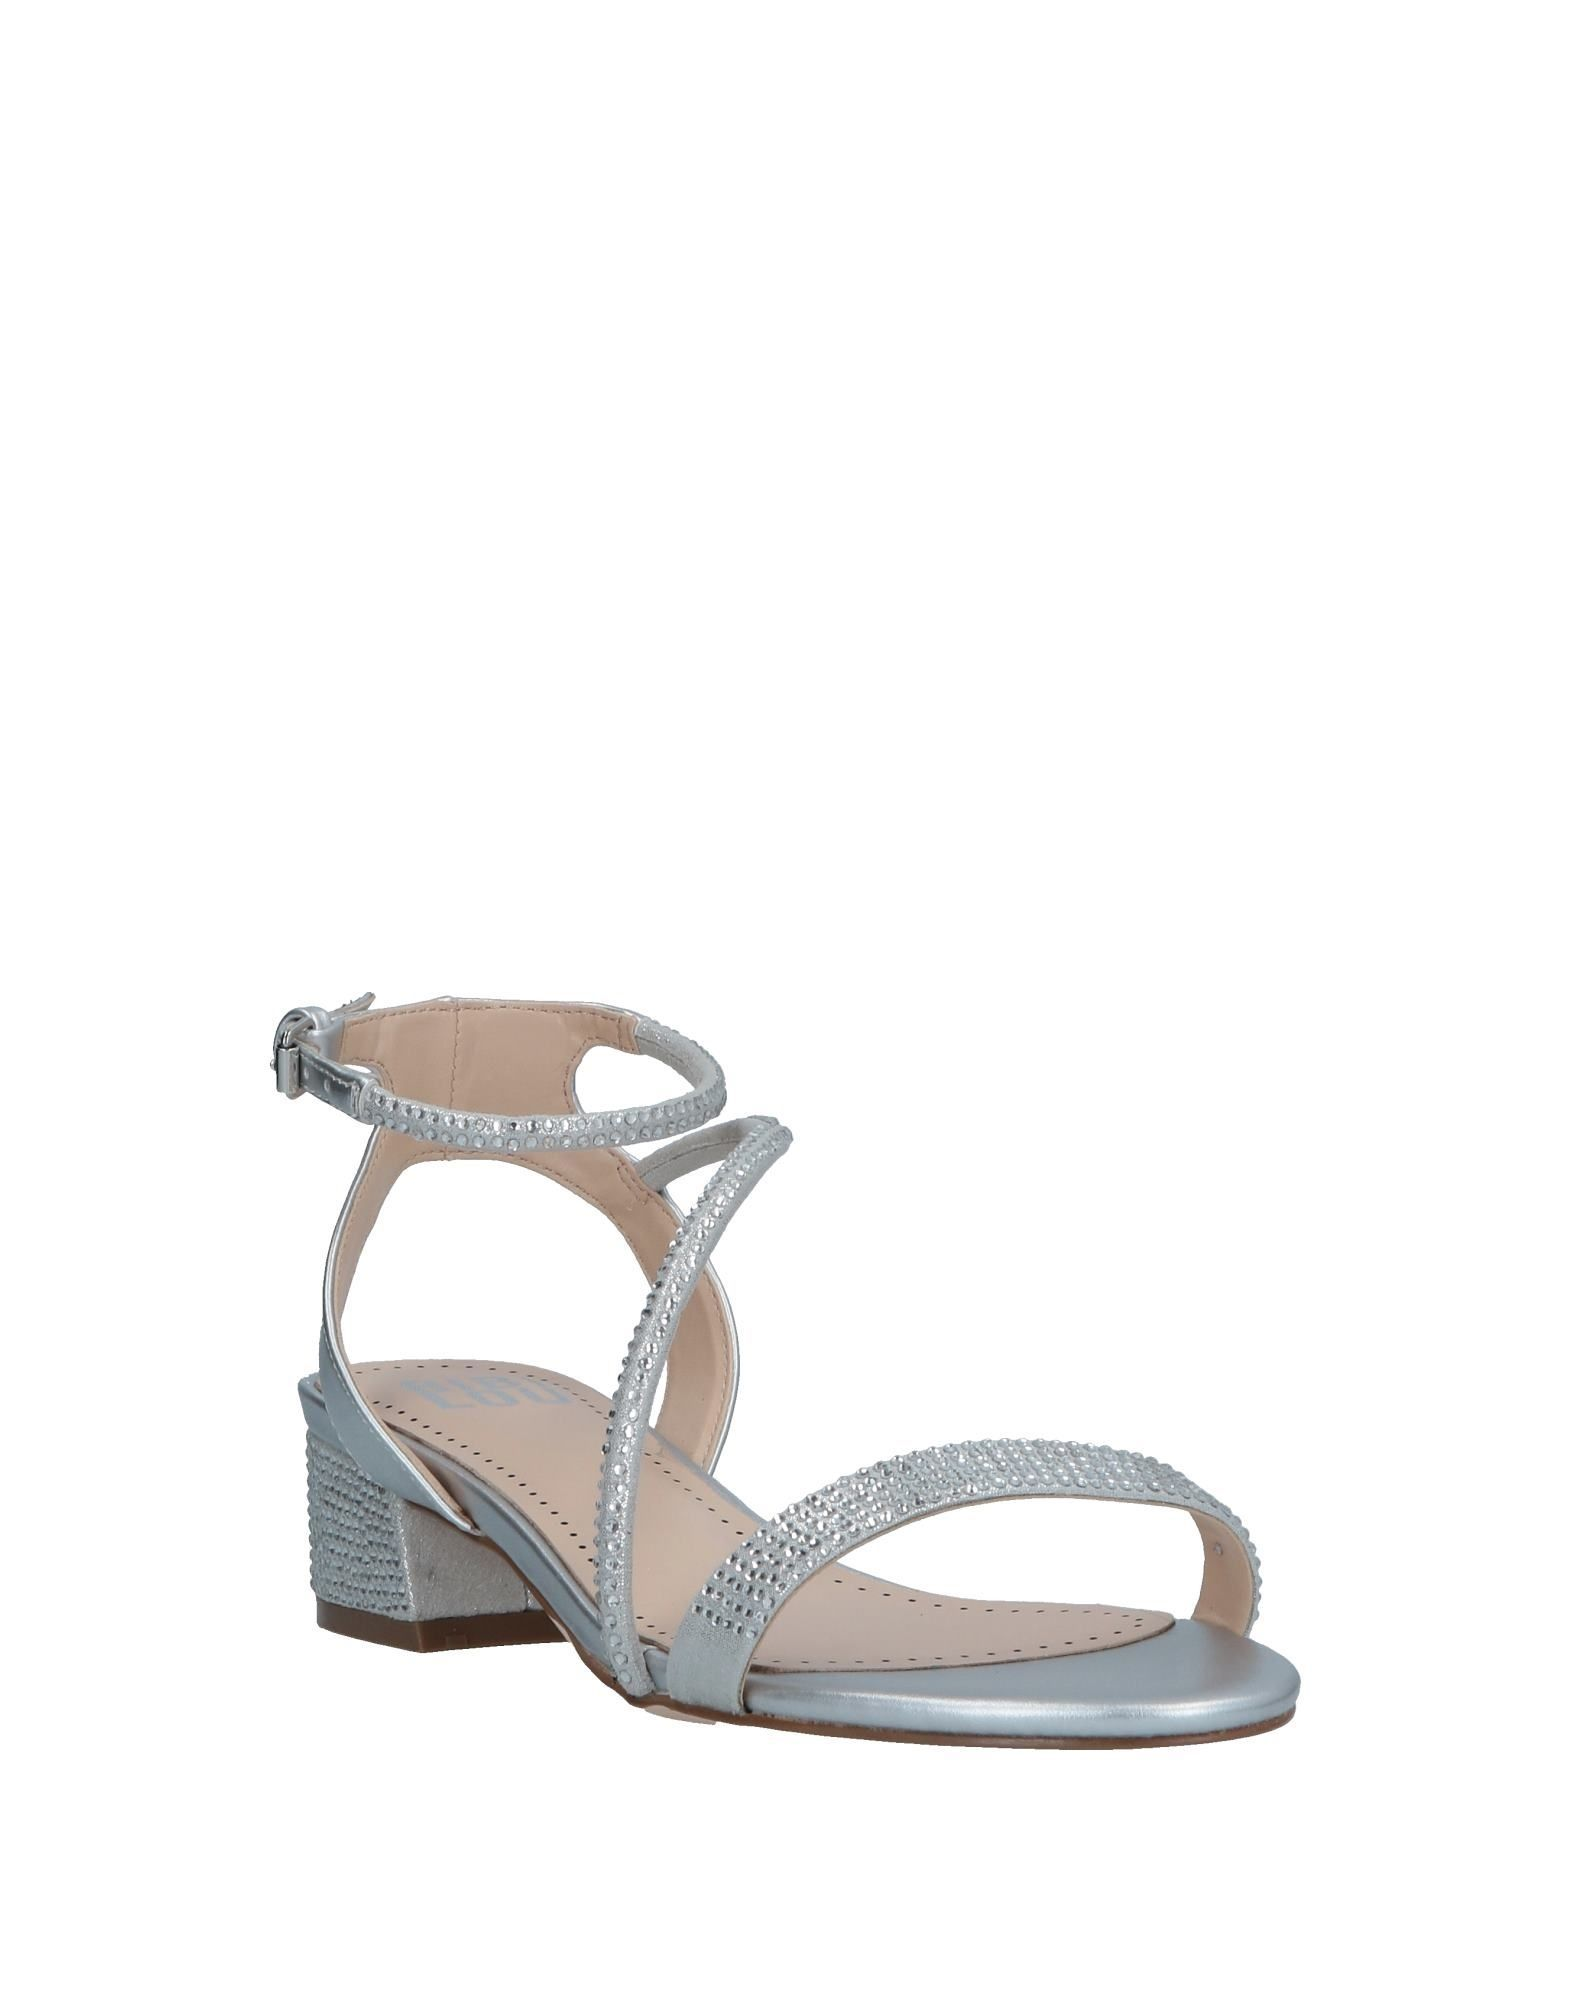 Bibi Lou Silver Low Heel Sandals